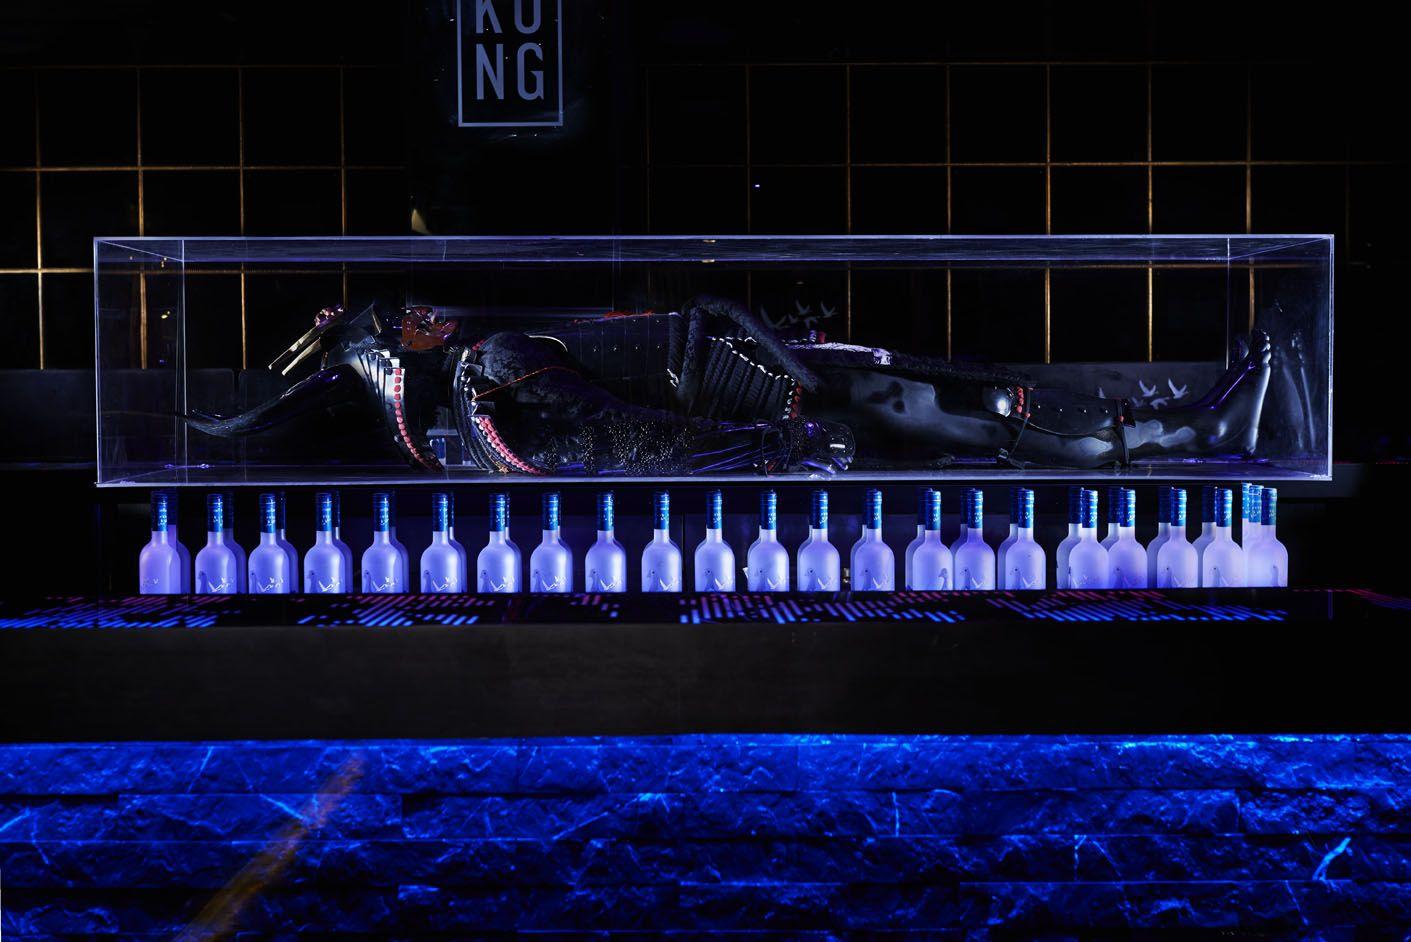 Kong Nightclub- Samurai back of bar  #greygoose #kong #nightclubdesign #bardesign #interiordesign #southafrica